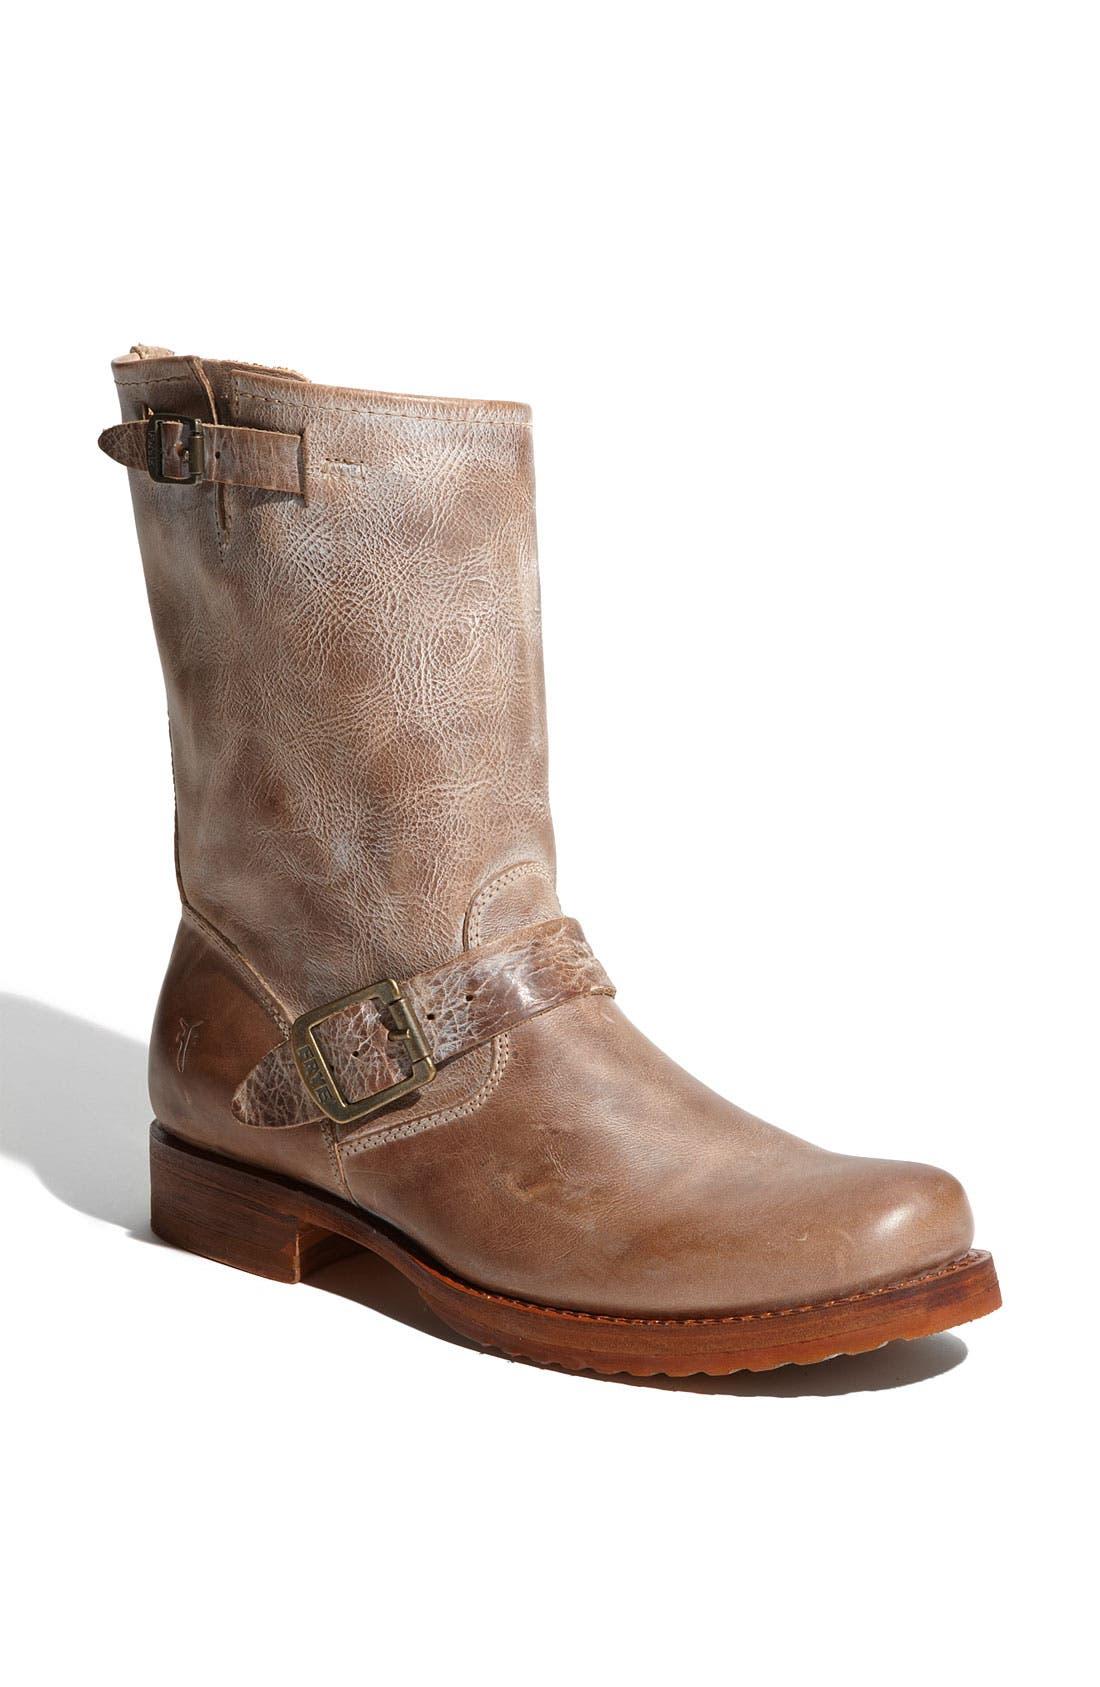 Alternate Image 1 Selected - Frye 'Veronica' Boot